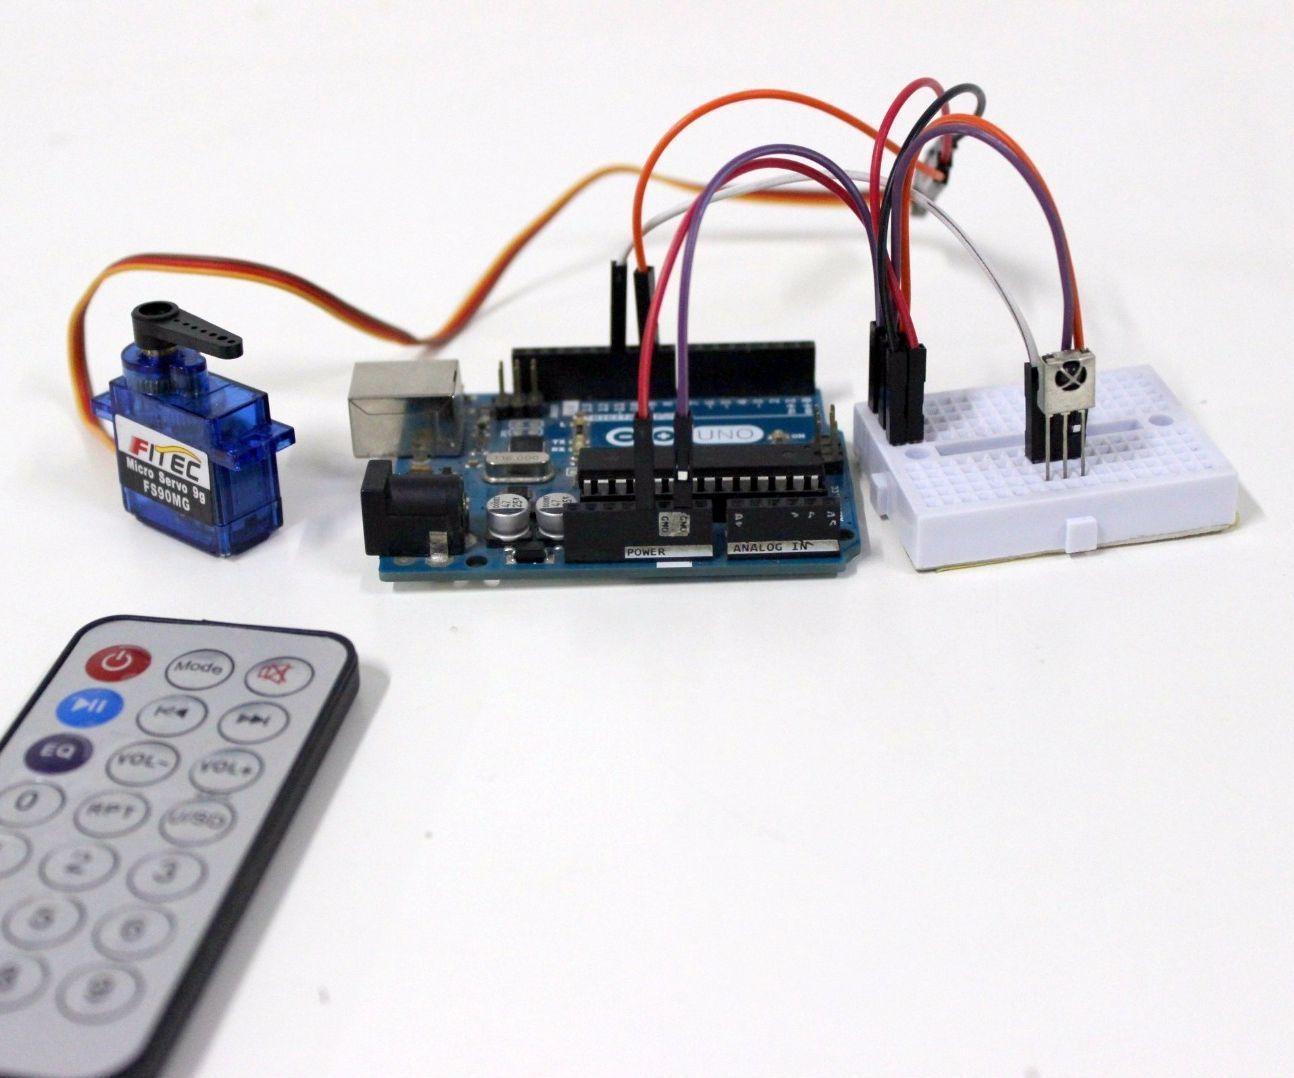 hight resolution of controlling servo motor using ir remote control